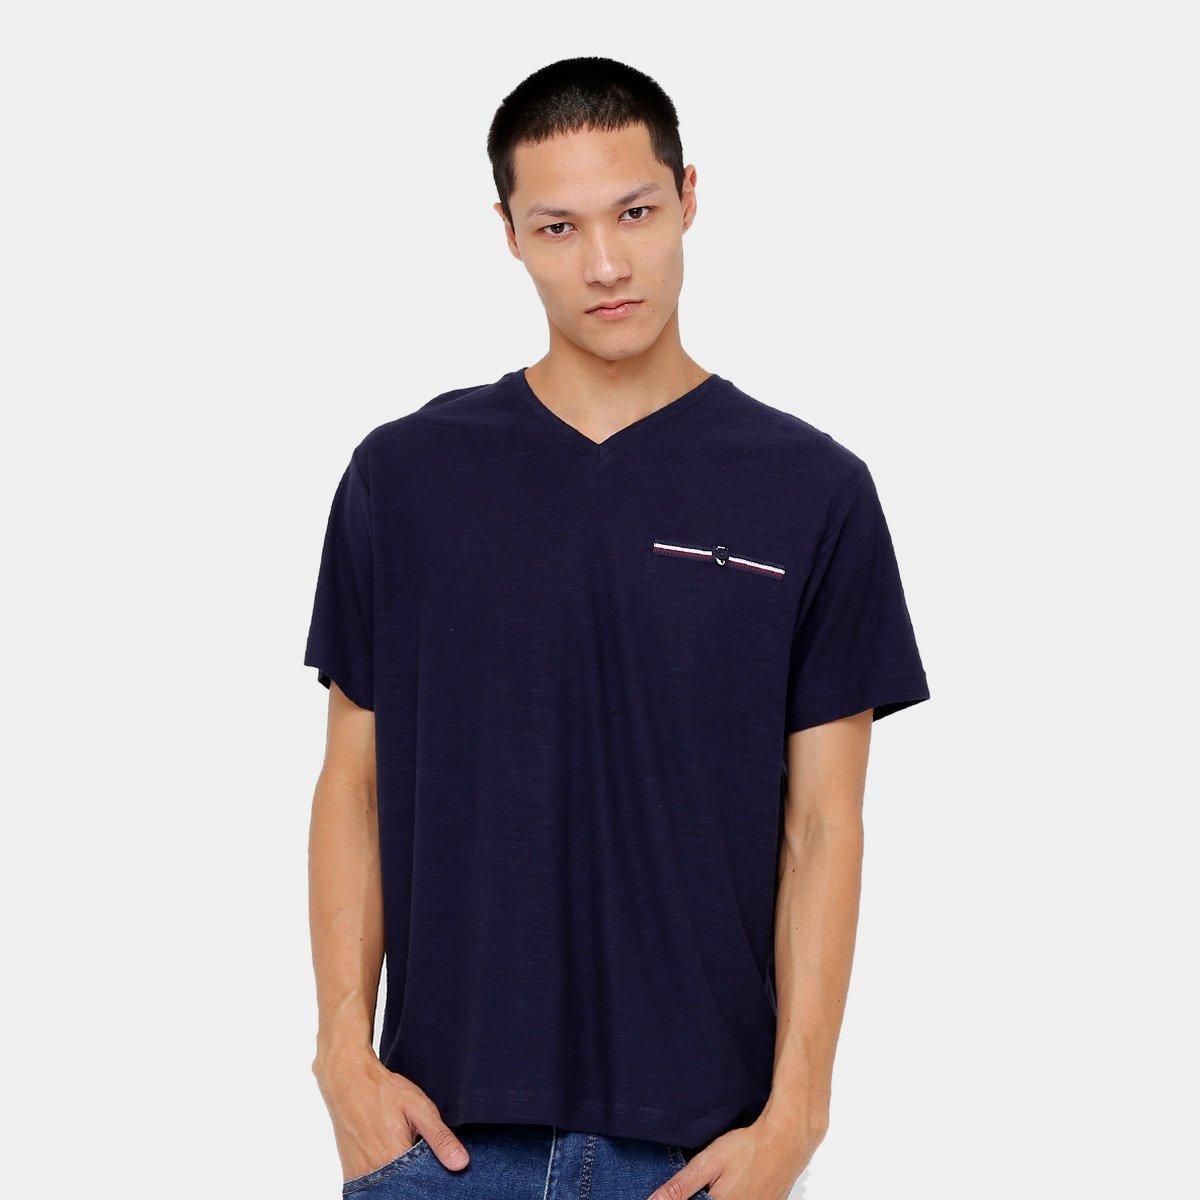 7c2eef1108 Camiseta Blue Bay Flamê Básica Masculina - Compre Agora